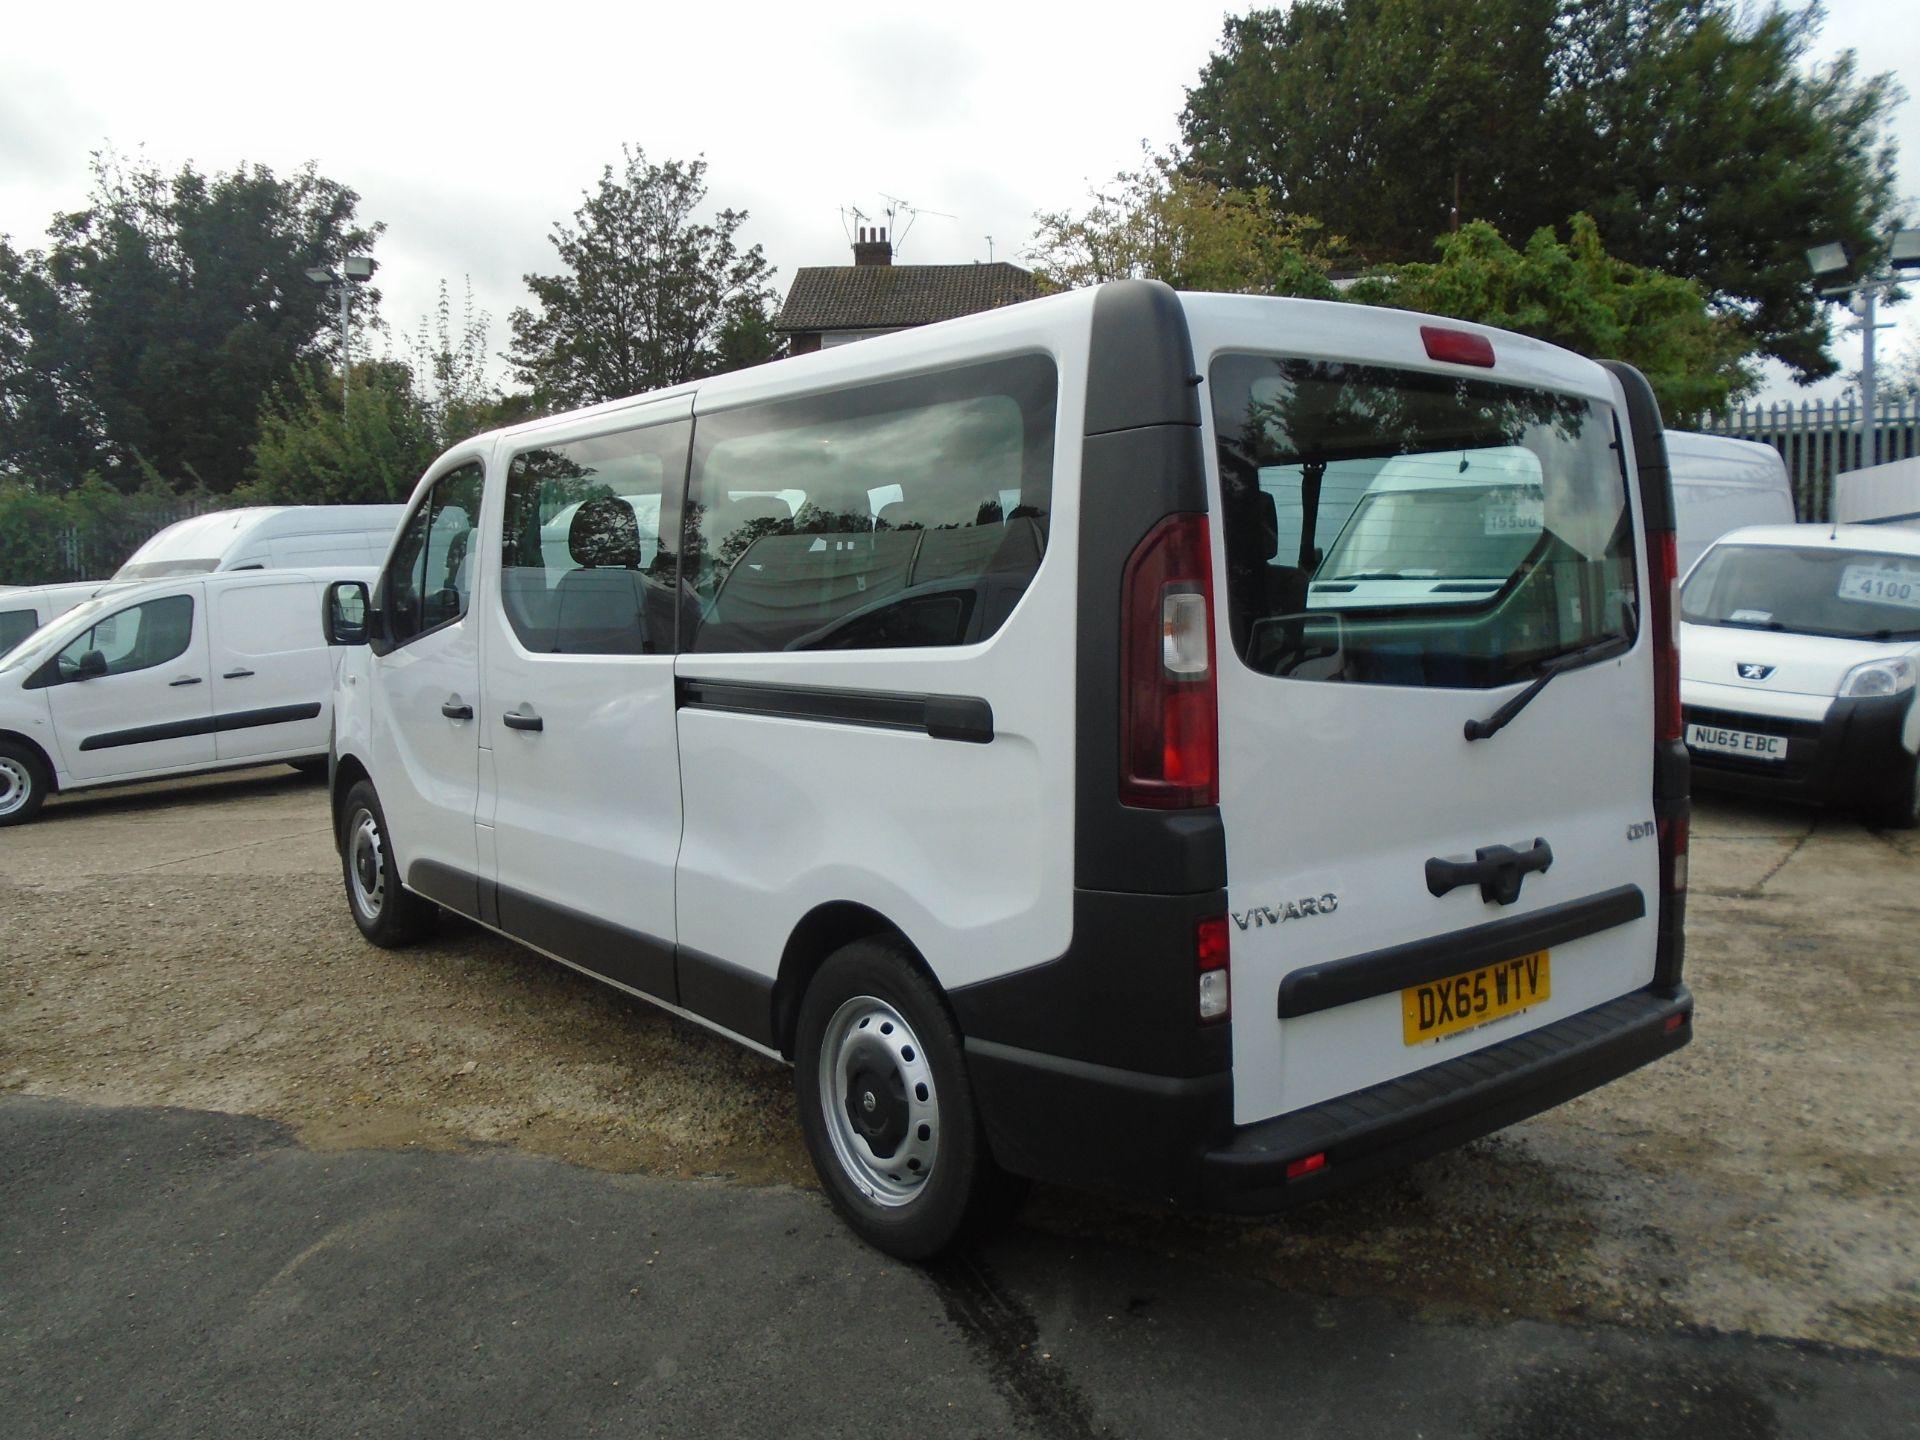 2015 Vauxhall Vivaro 2900 1.6Cdti 115Ps H1 Combi 9 Seat (DX65WTV) Image 4